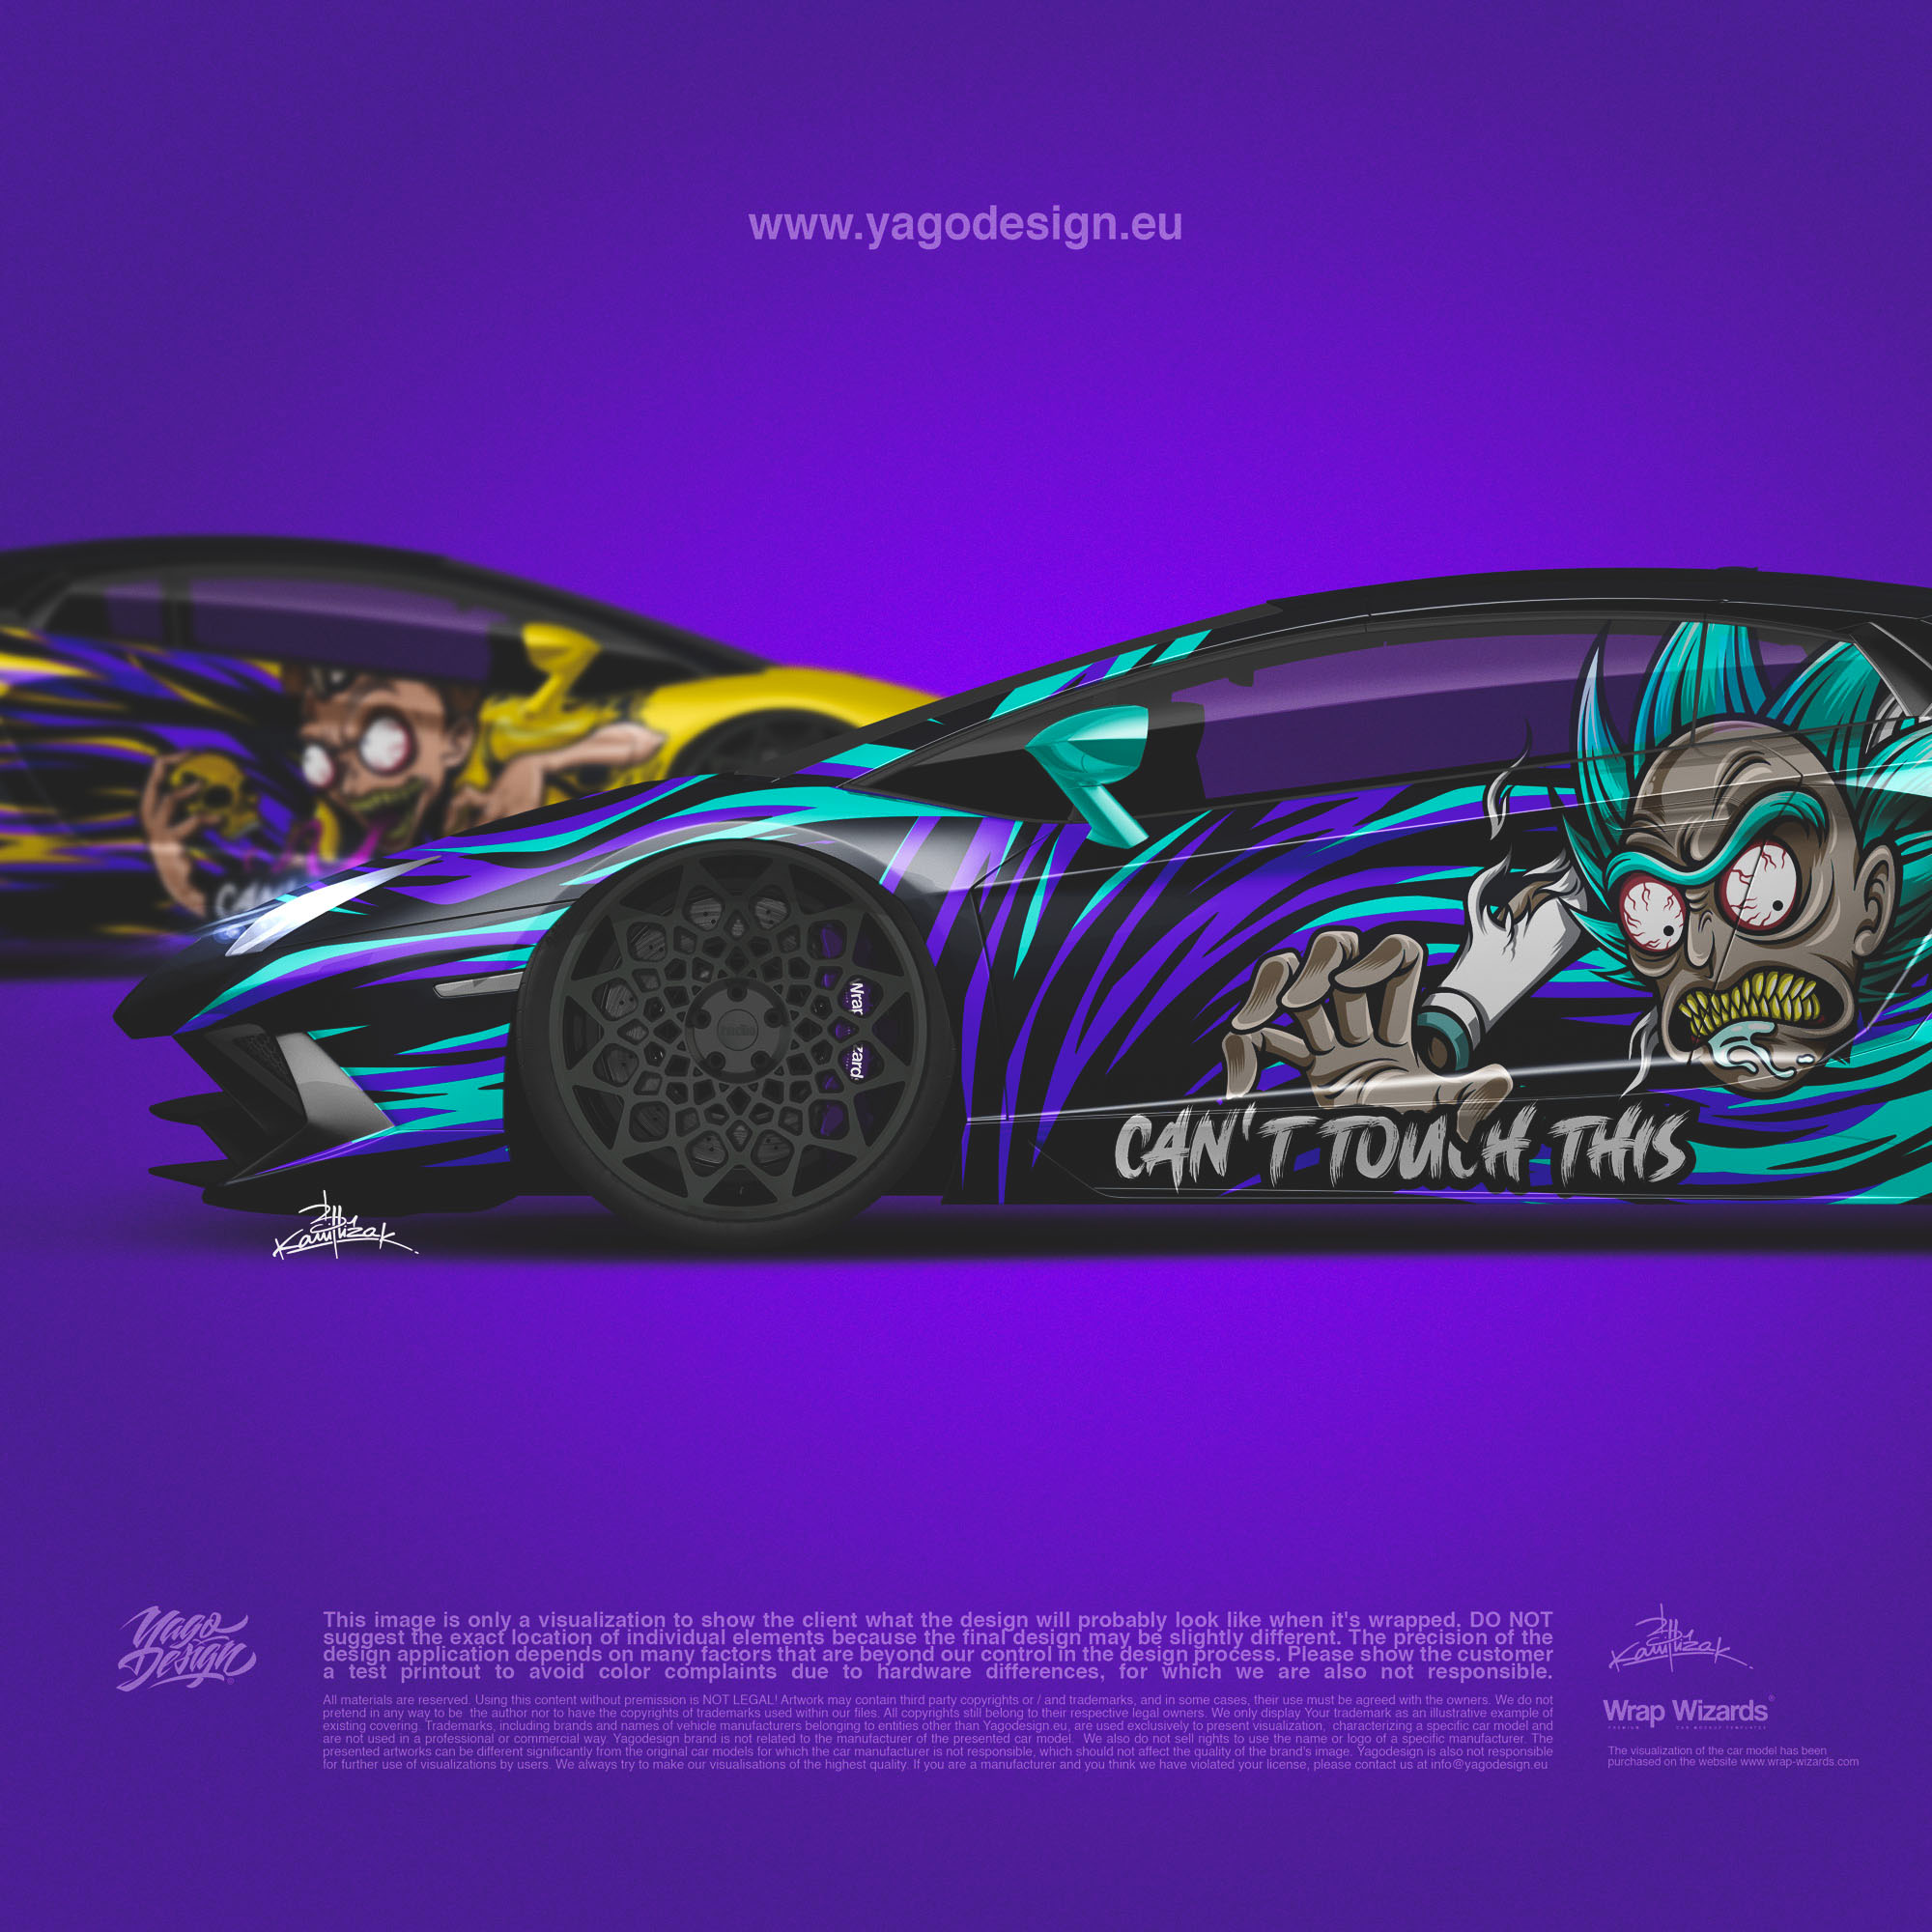 Lamborghini-Aventador-LP750-4-SV-Roadster-2016-sv3